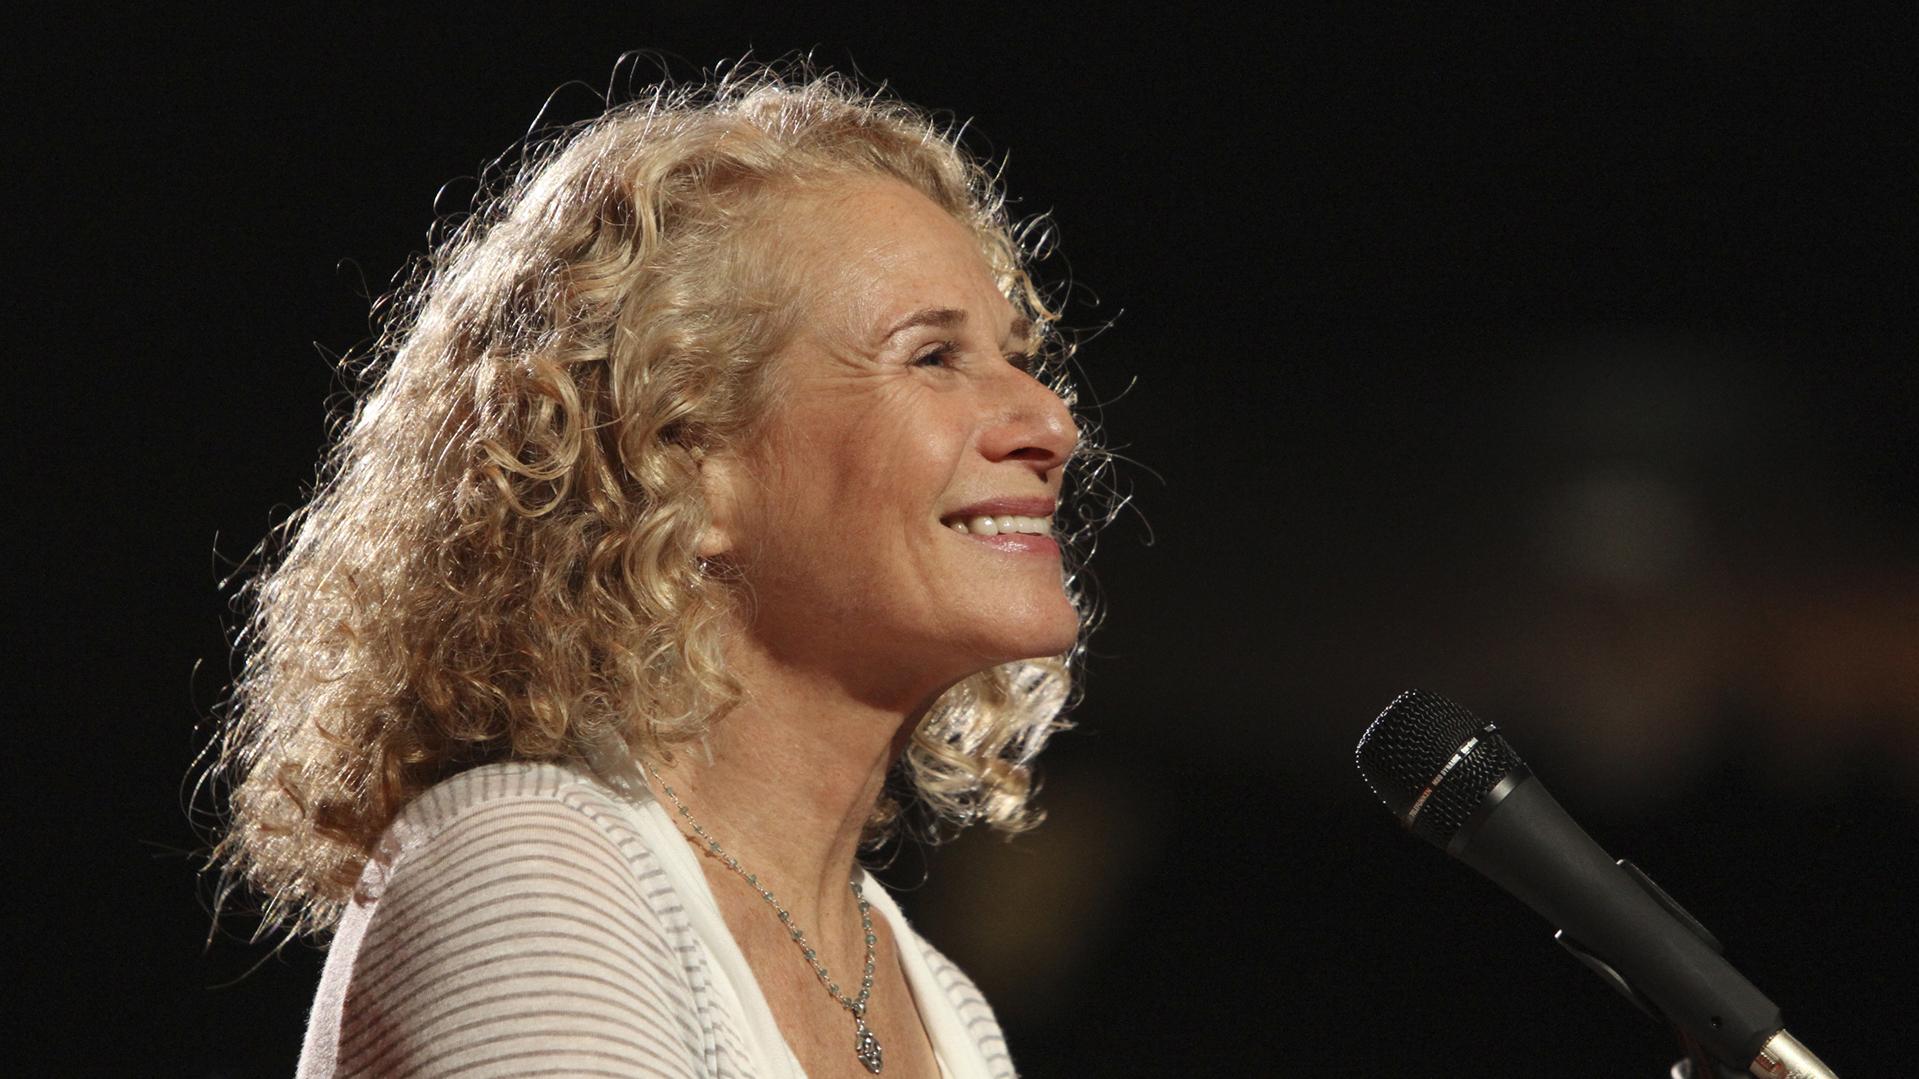 Carole King. Photo Credit: Elissa Kline